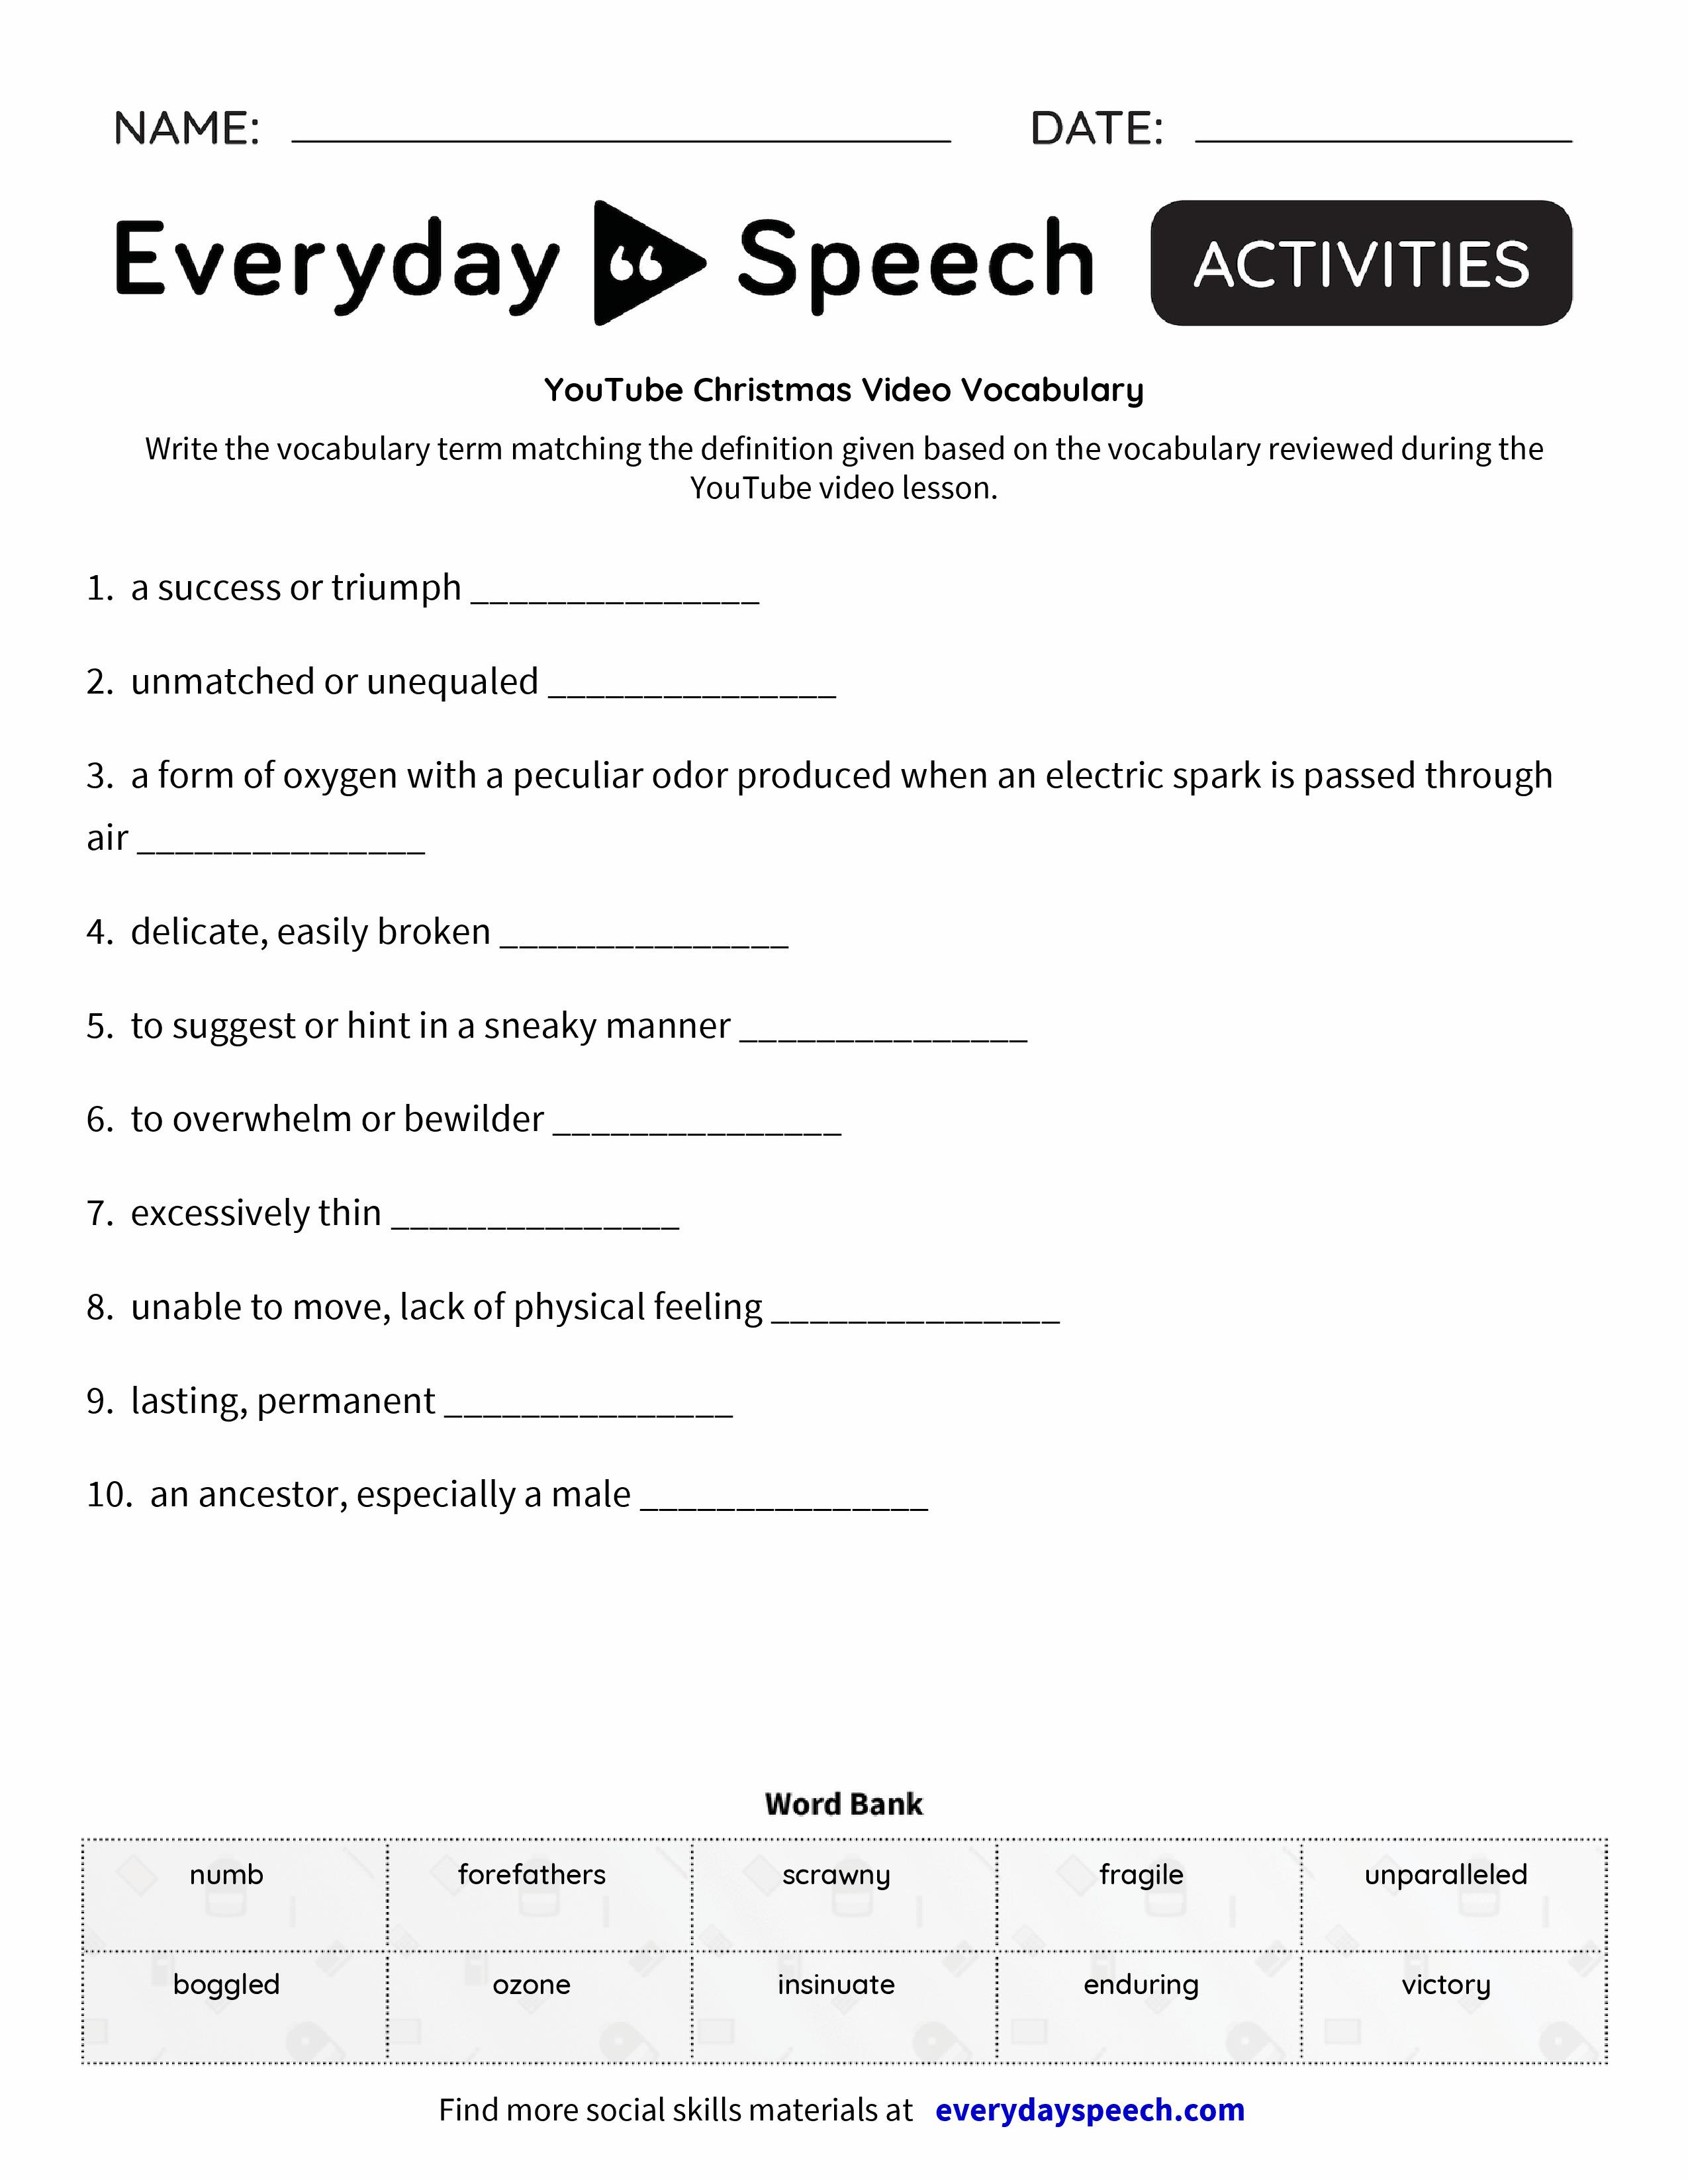 YouTube Christmas Video Vocabulary - Everyday Speech - Everyday Speech